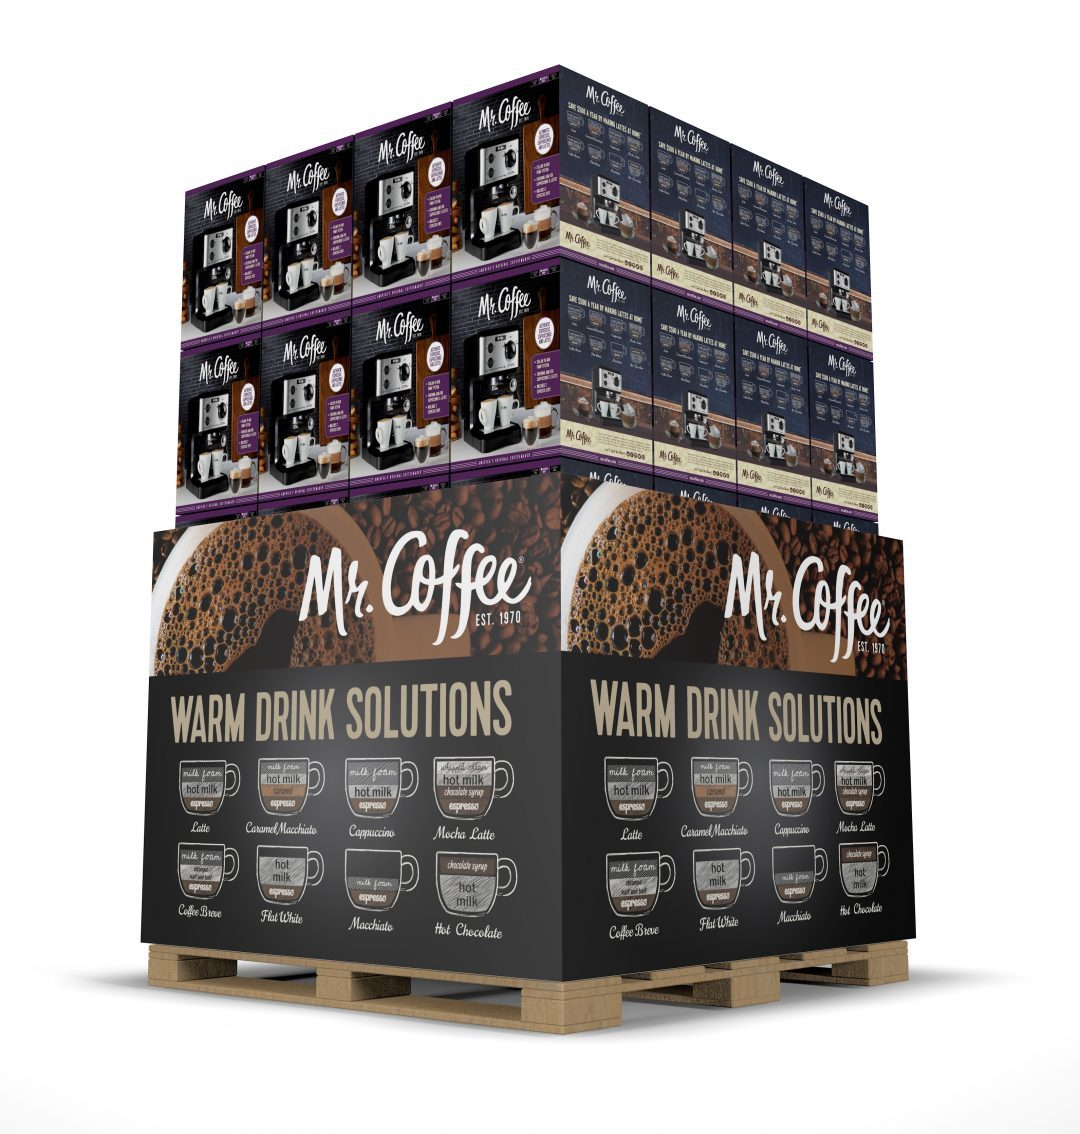 Mr Coffee palette promo